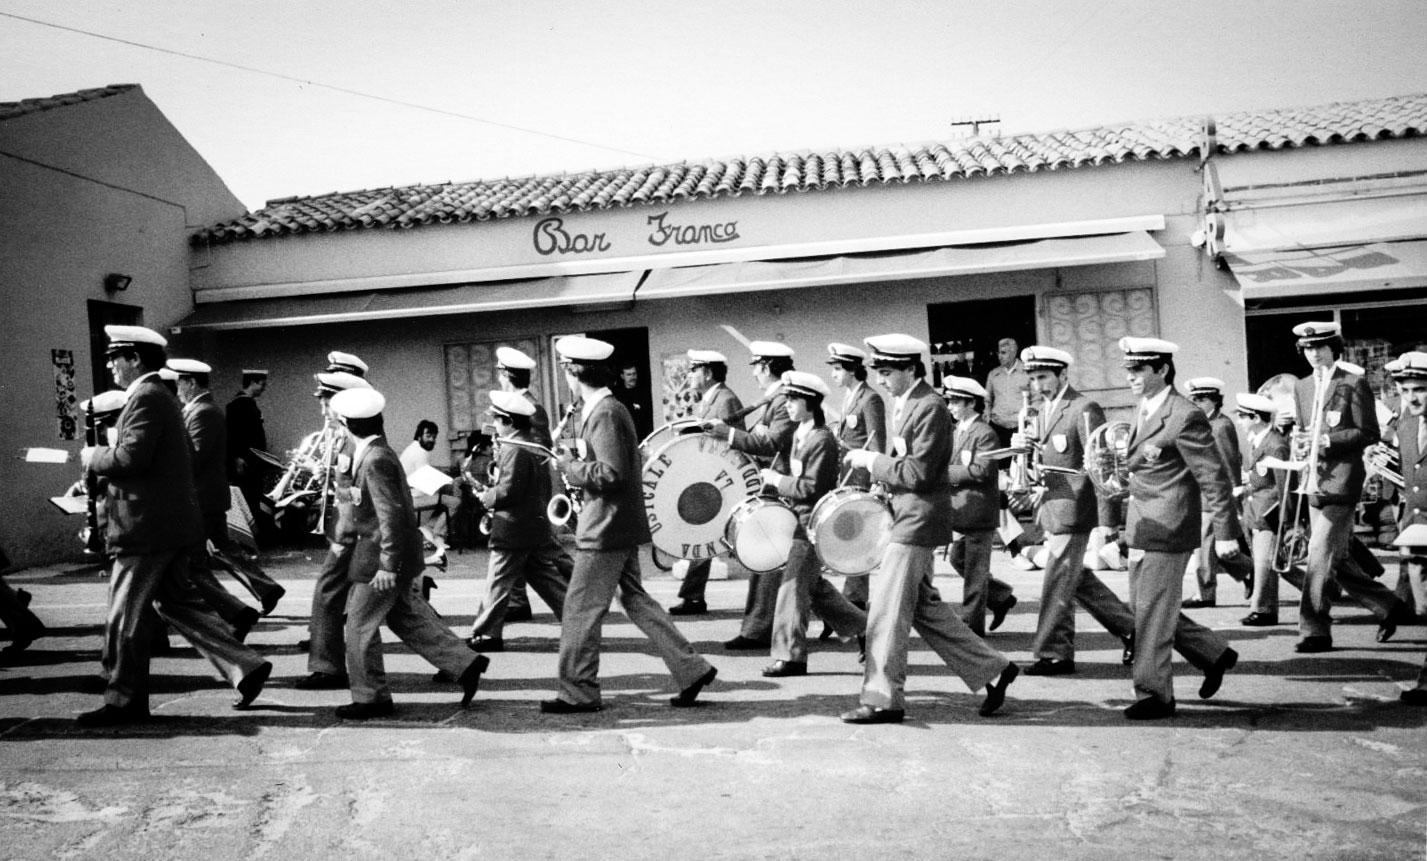 Municipal Marching Band, Palau, Sardegna Italy